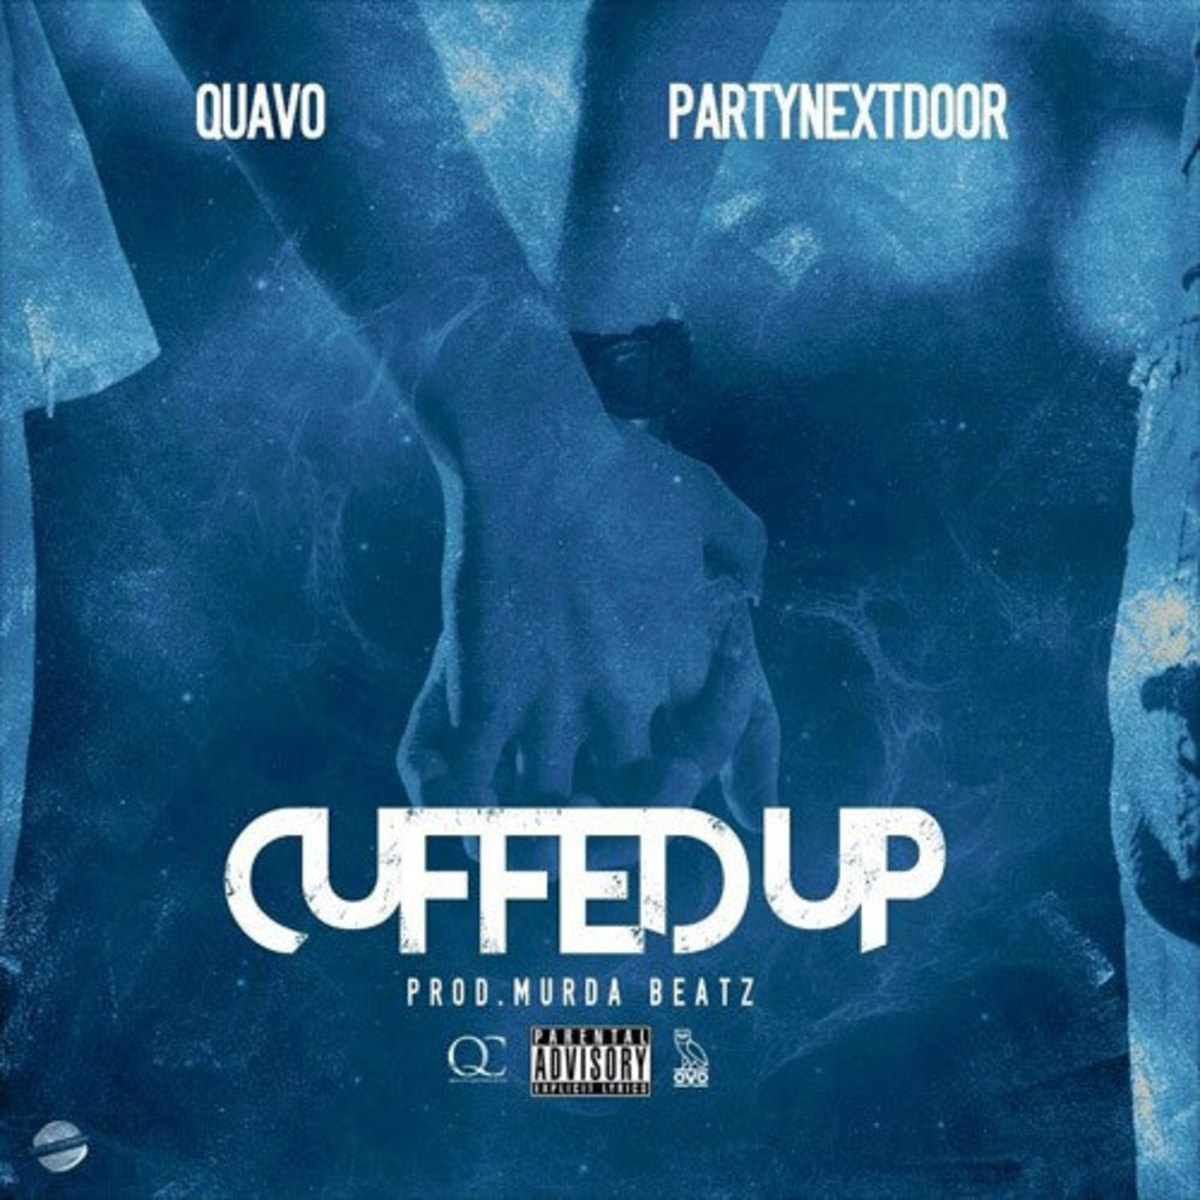 quavo-cuffed-up.jpg